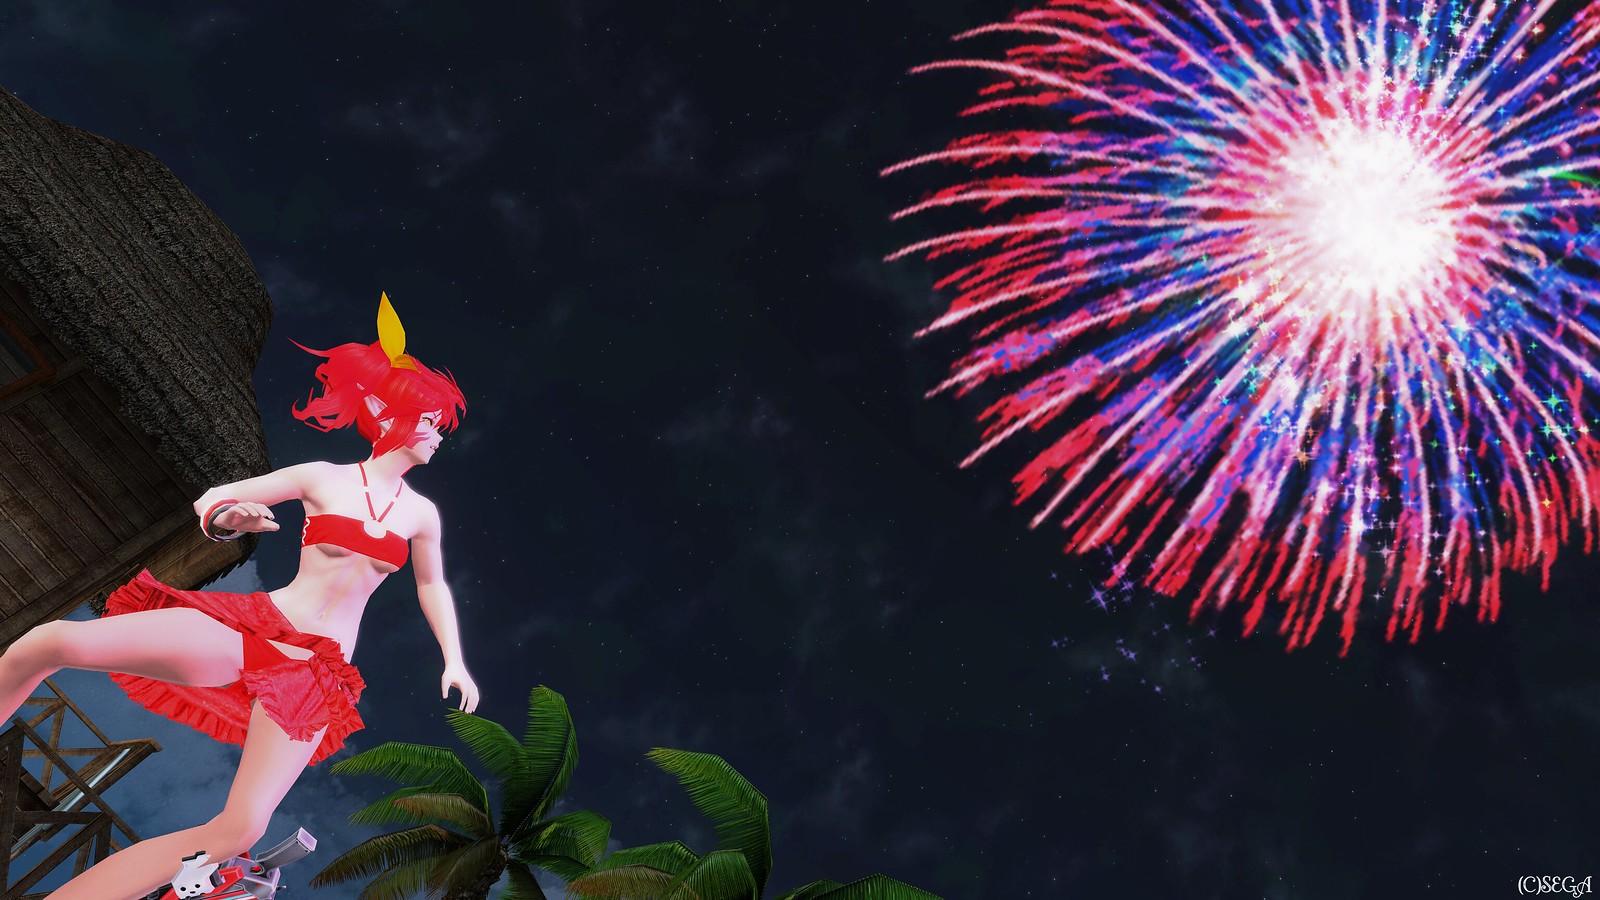 Phantasy Star Online 2 Screenshot 2020.07.26 - 11.44.01.01